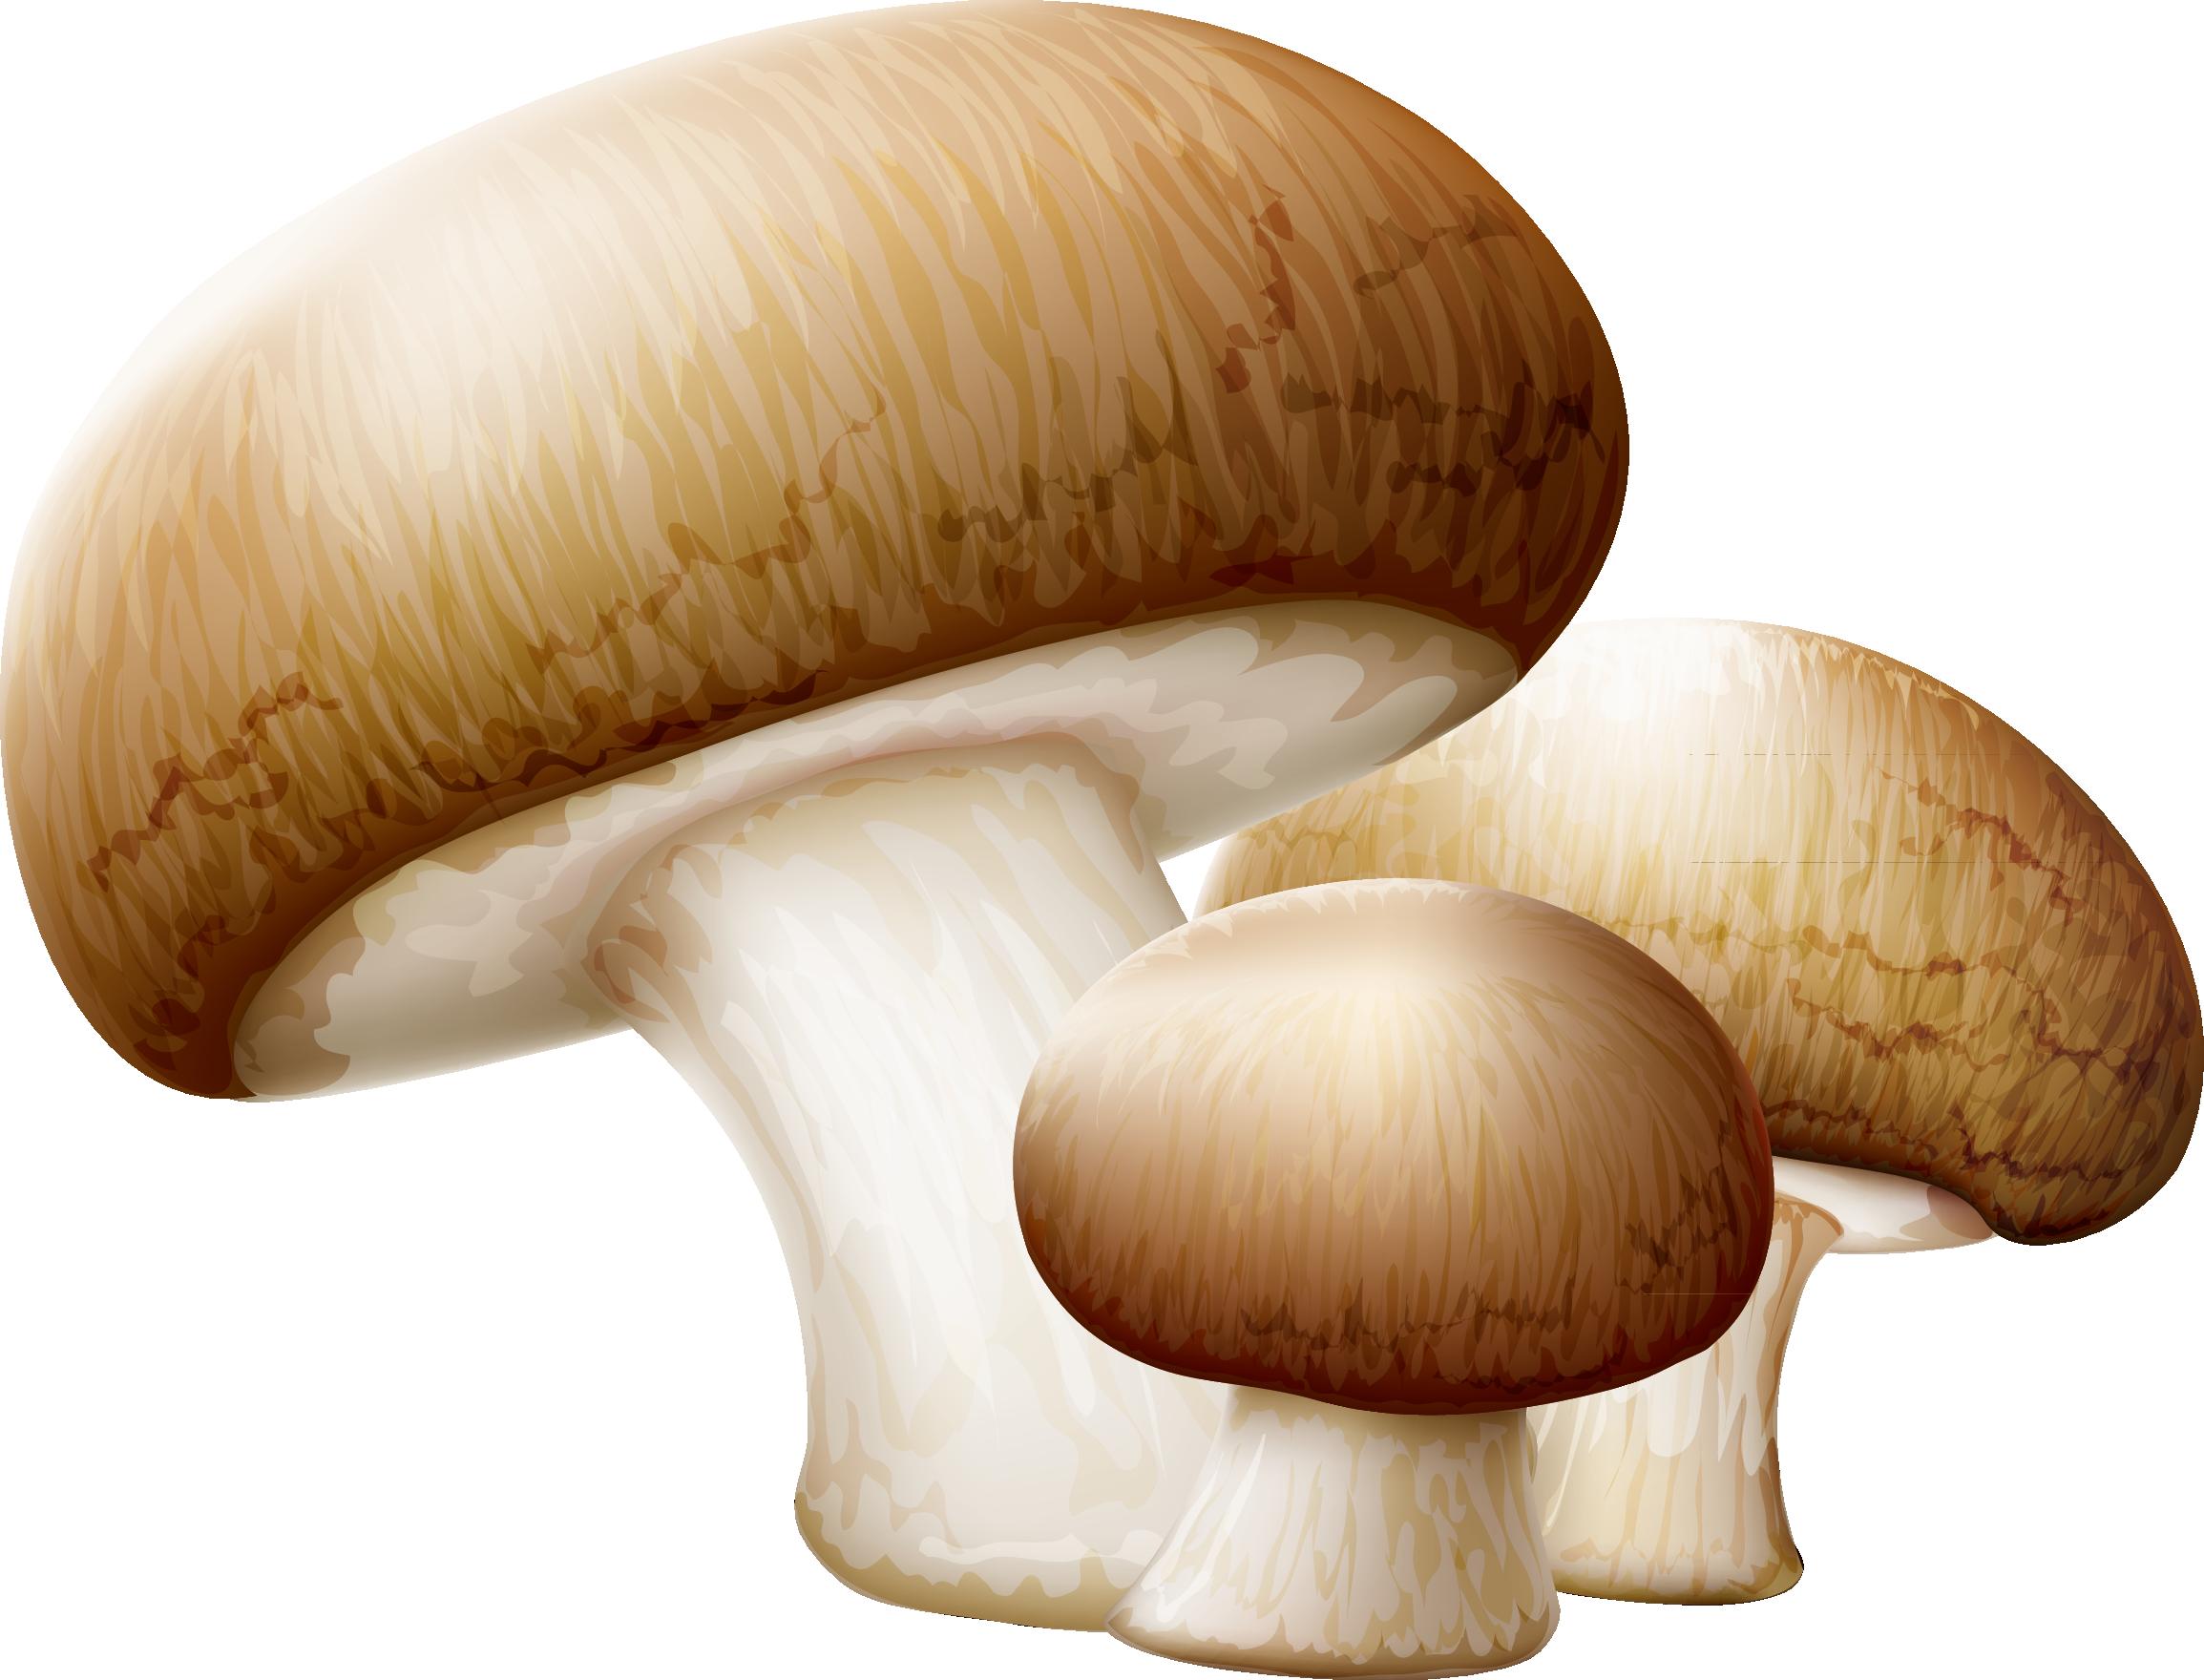 Common clip art mushrooms. Mushroom clipart edible mushroom